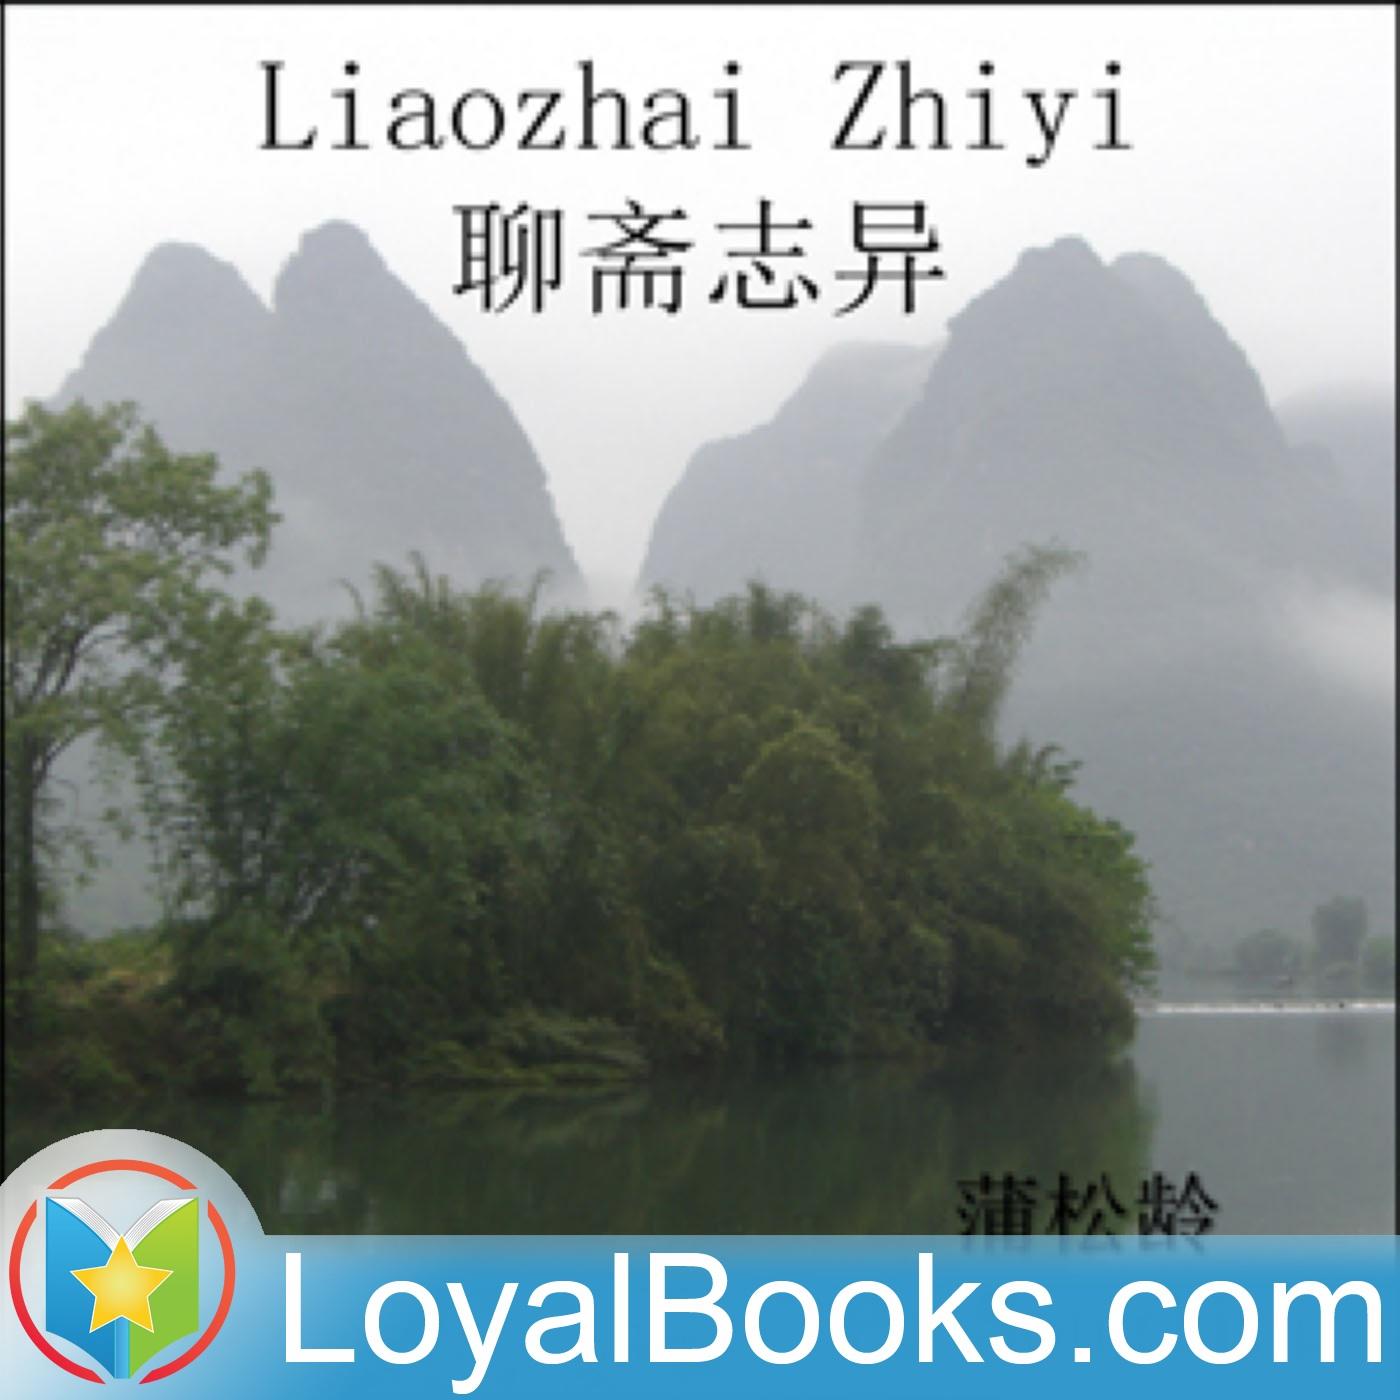 <![CDATA[Liaozhai Zhiyi 聊斋志异 by 蒲松龄 (Pu Songling)]]>